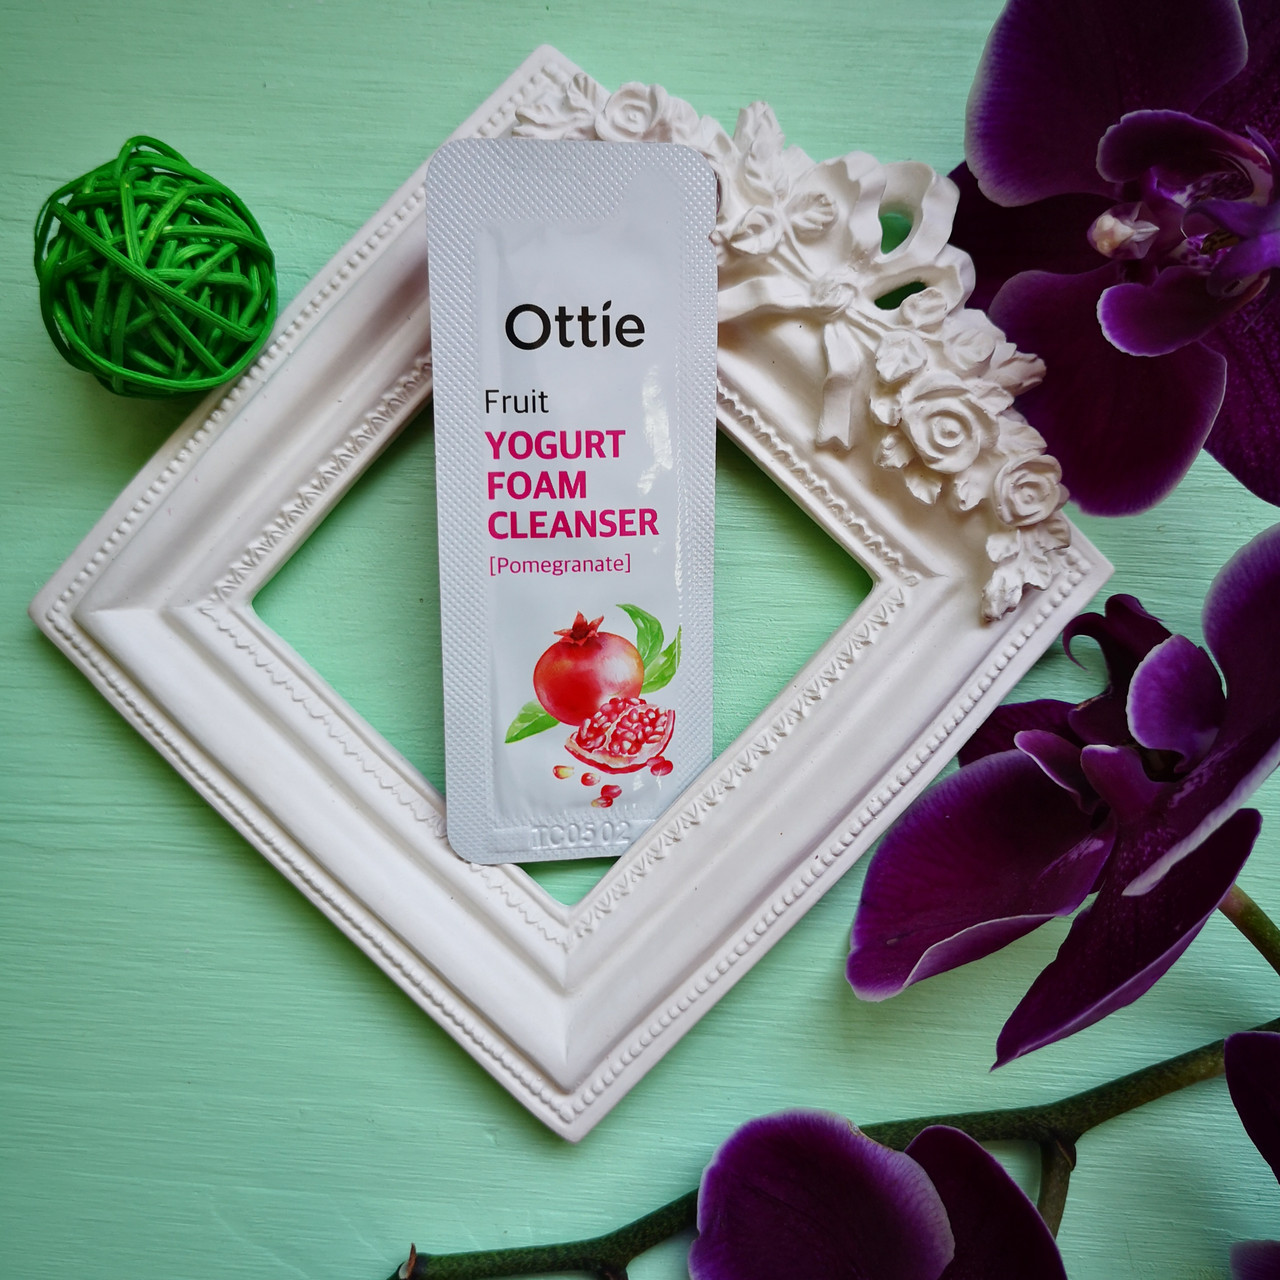 Ottie Пробник Йогуртовая пенка для умывания с экстрактом граната Fruits Yogurt Foam Cleanser Pomegranate